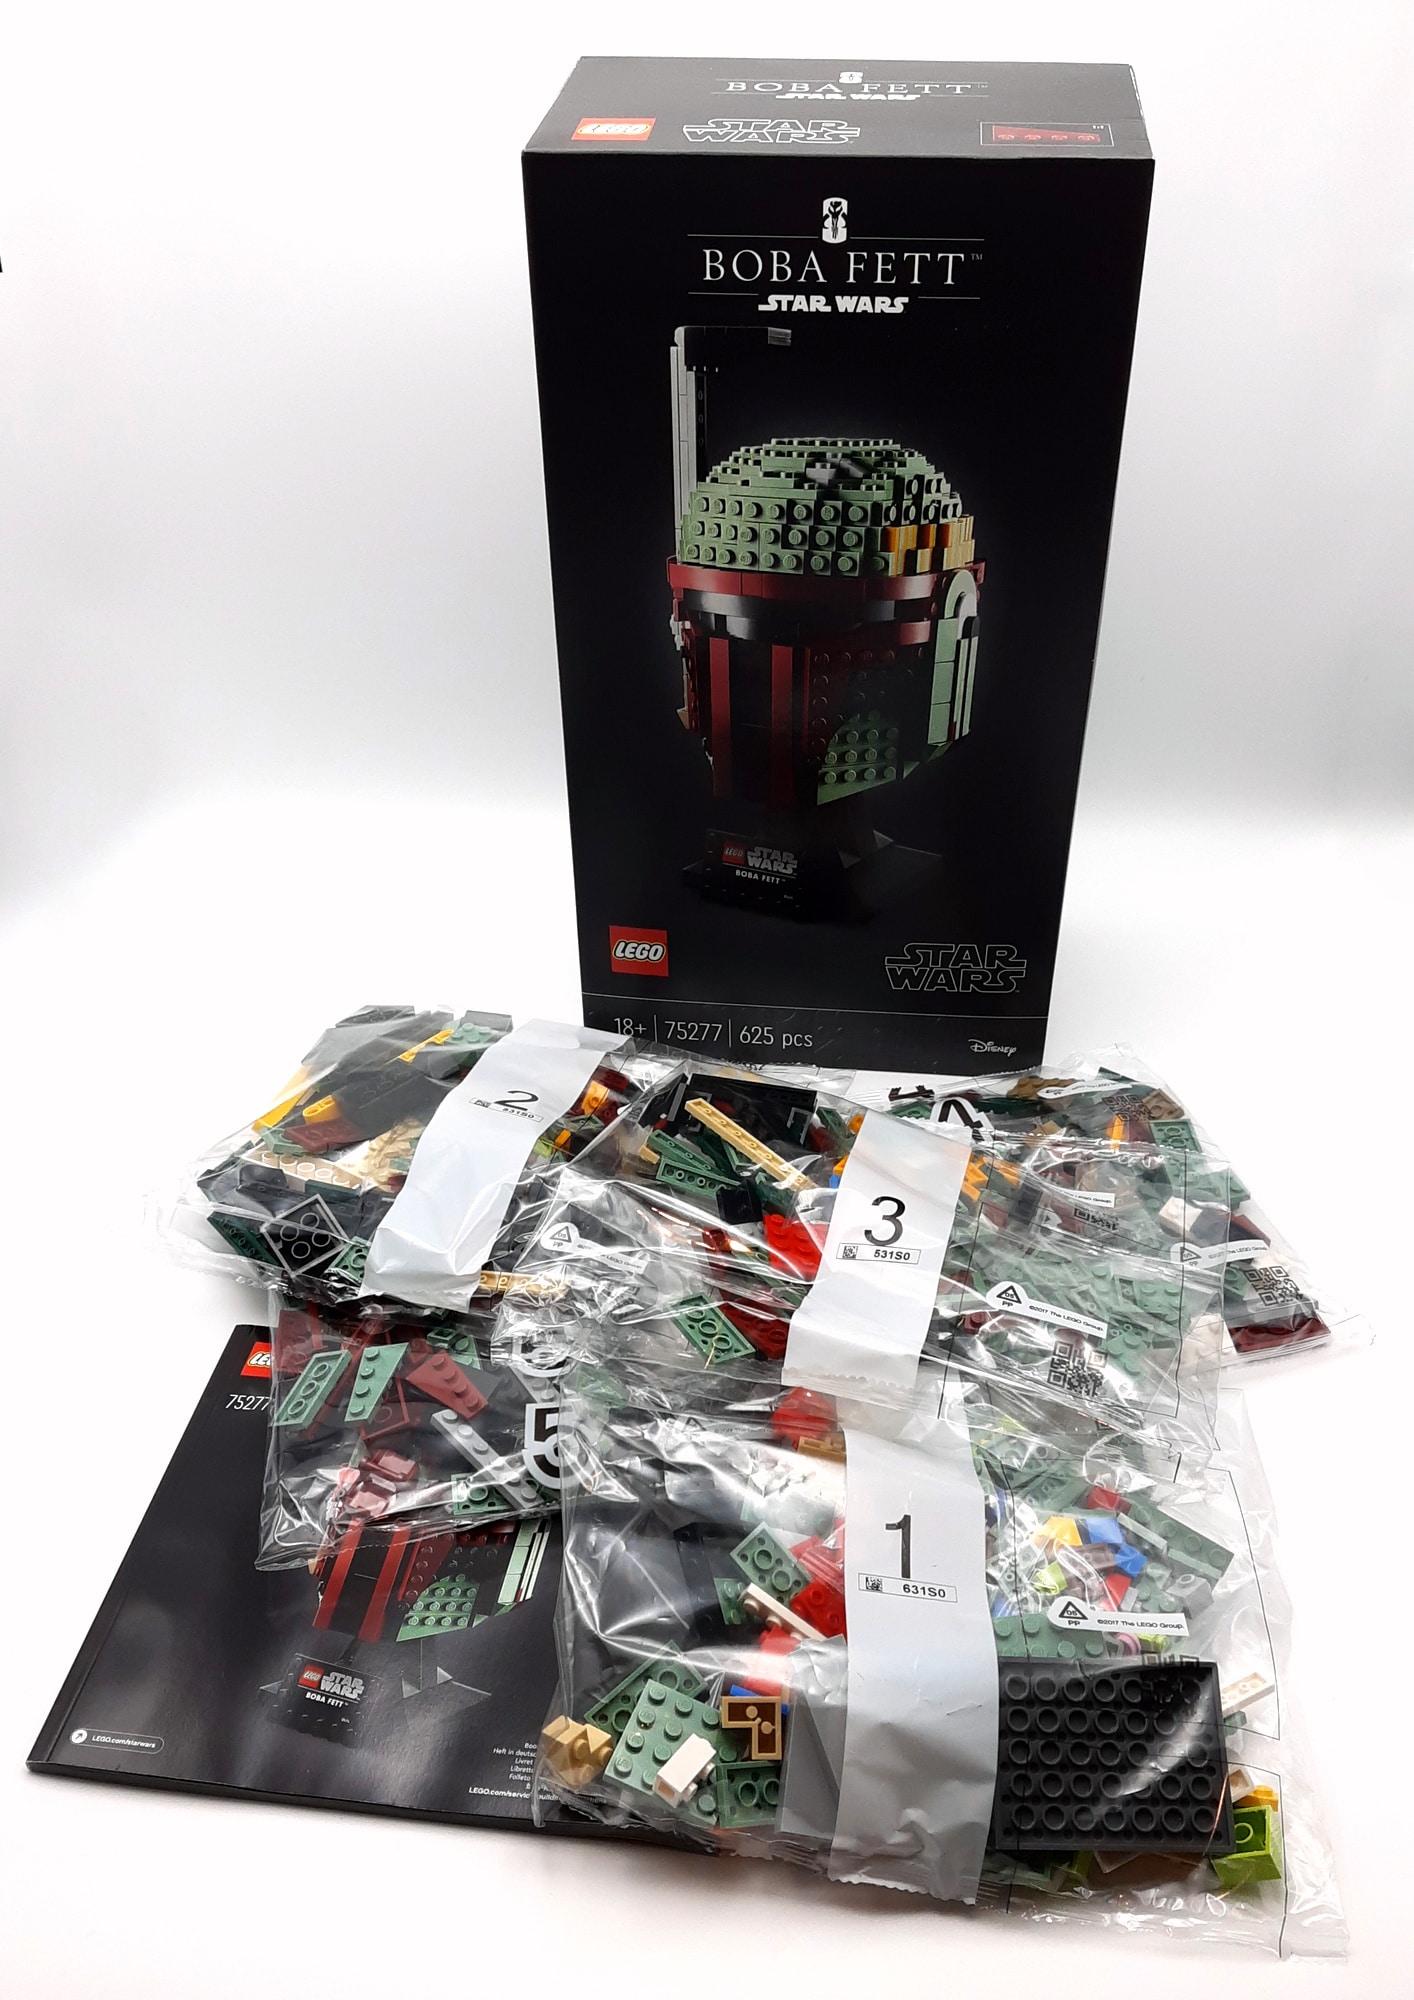 LEGO 75277 Boba Fett Helm Box Inhalt